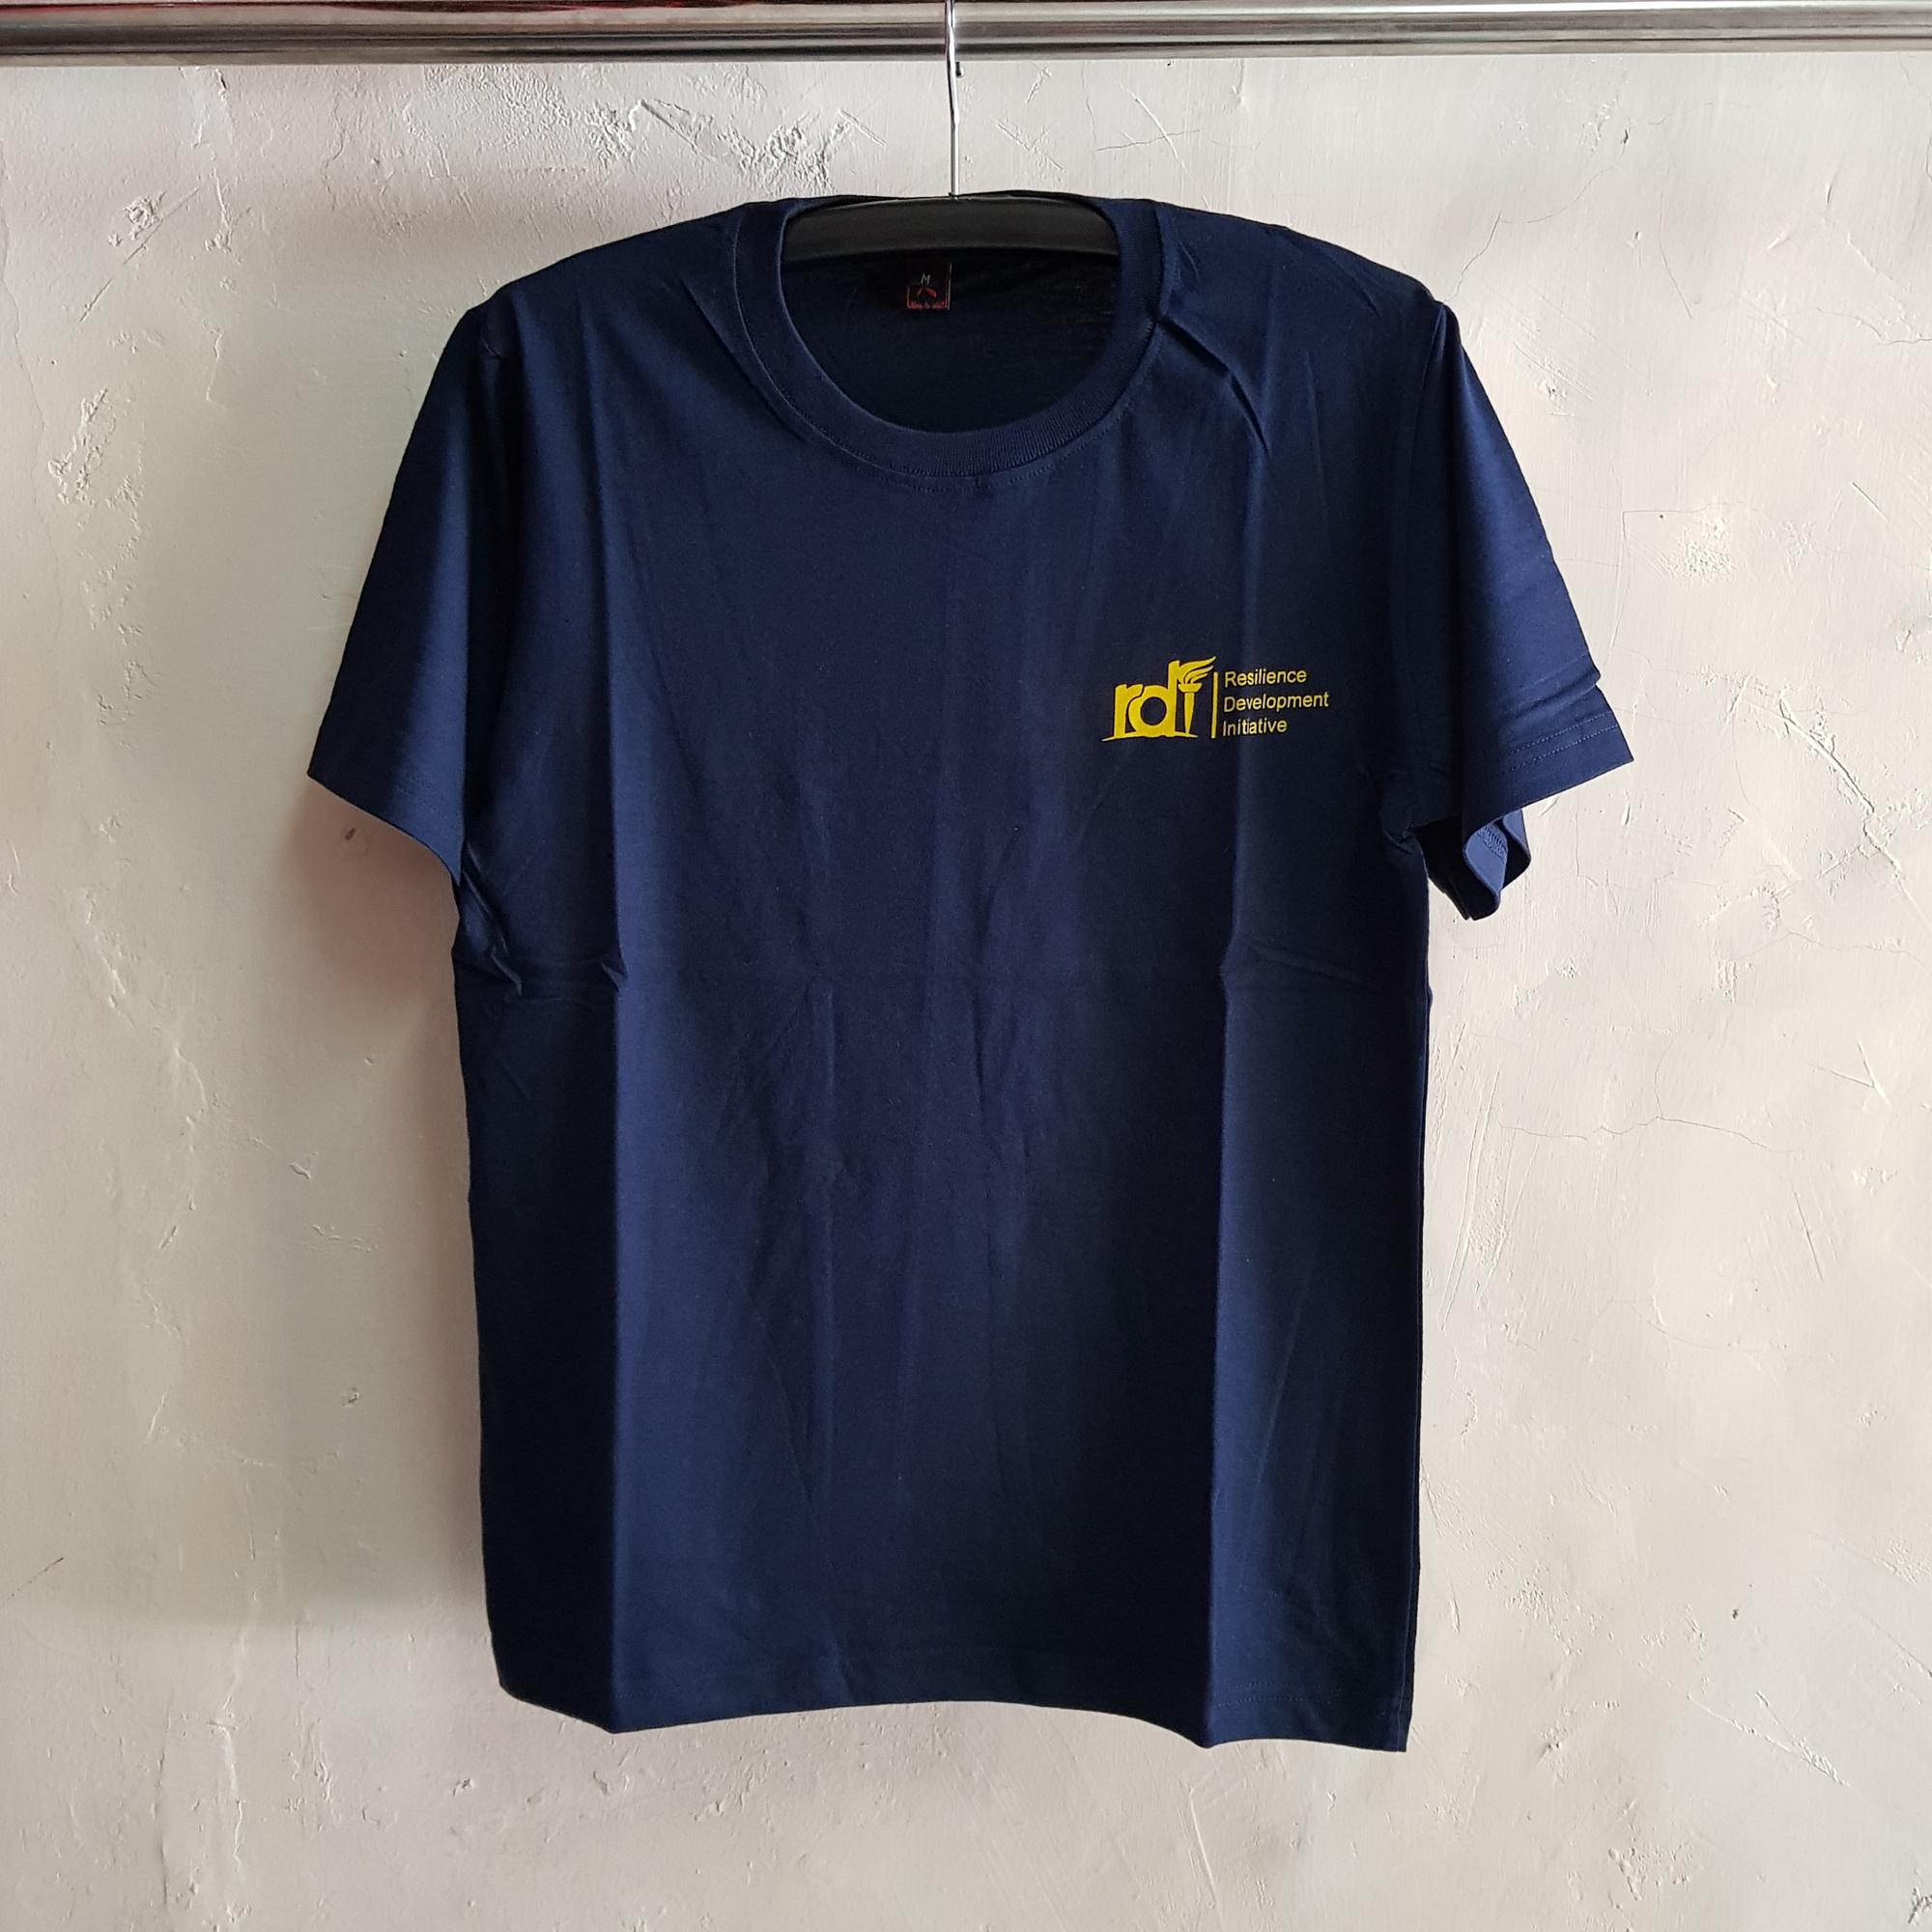 Seragam Kaos RDI, T-Shirt Oblong Navy